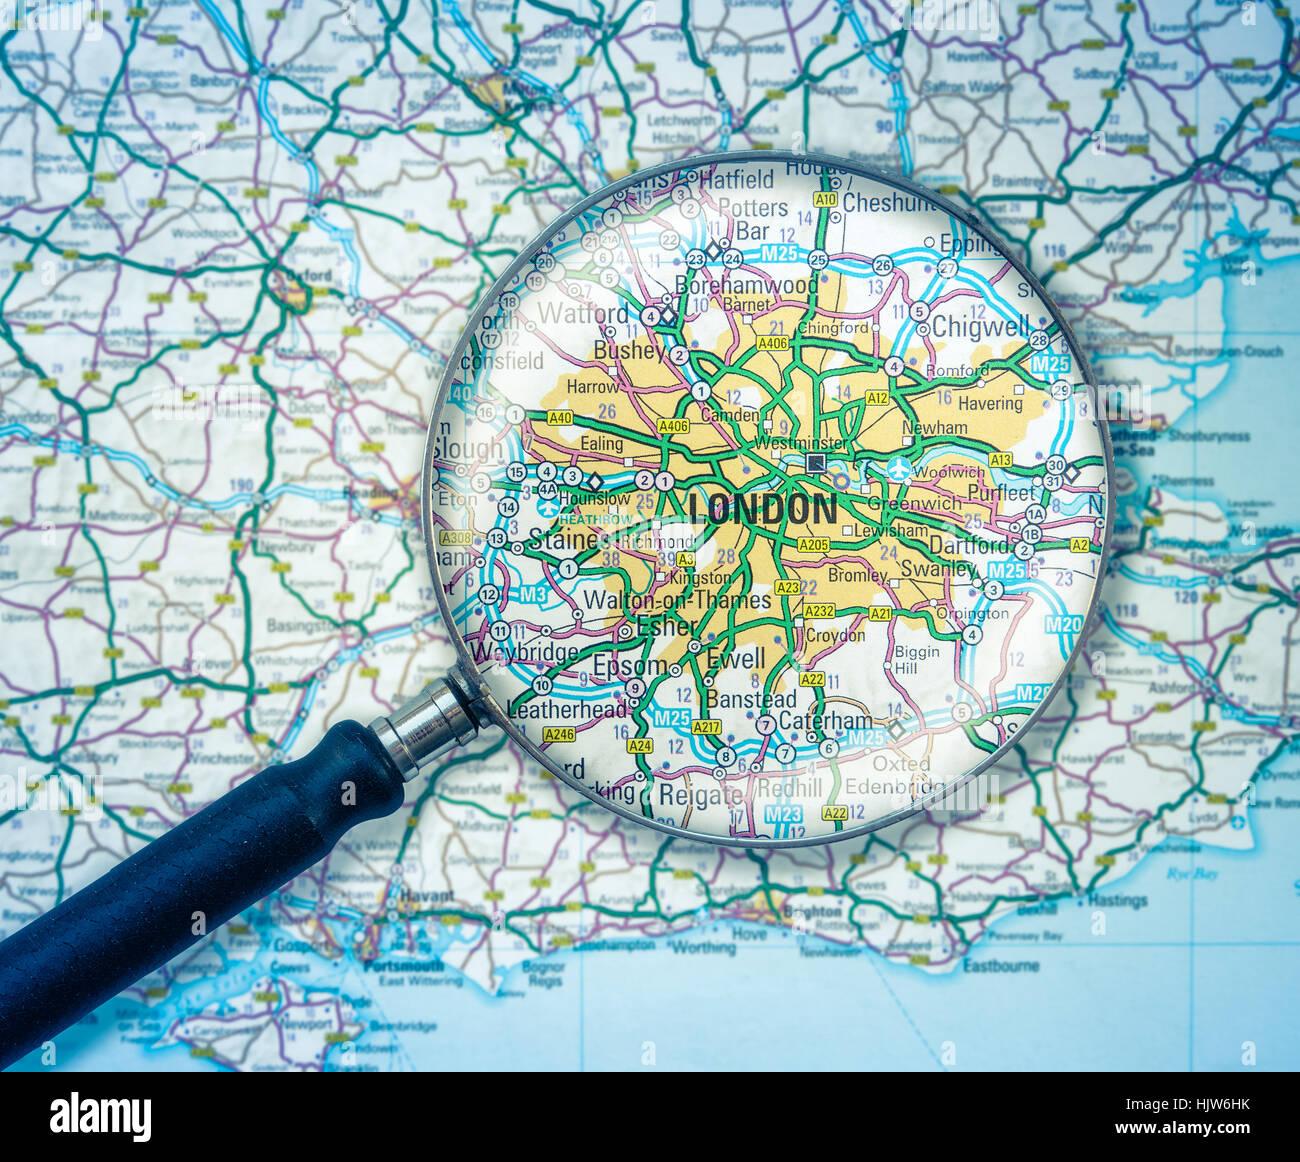 Londra Cartina.Mappa Stradale Di Londra Immagini E Fotos Stock Alamy